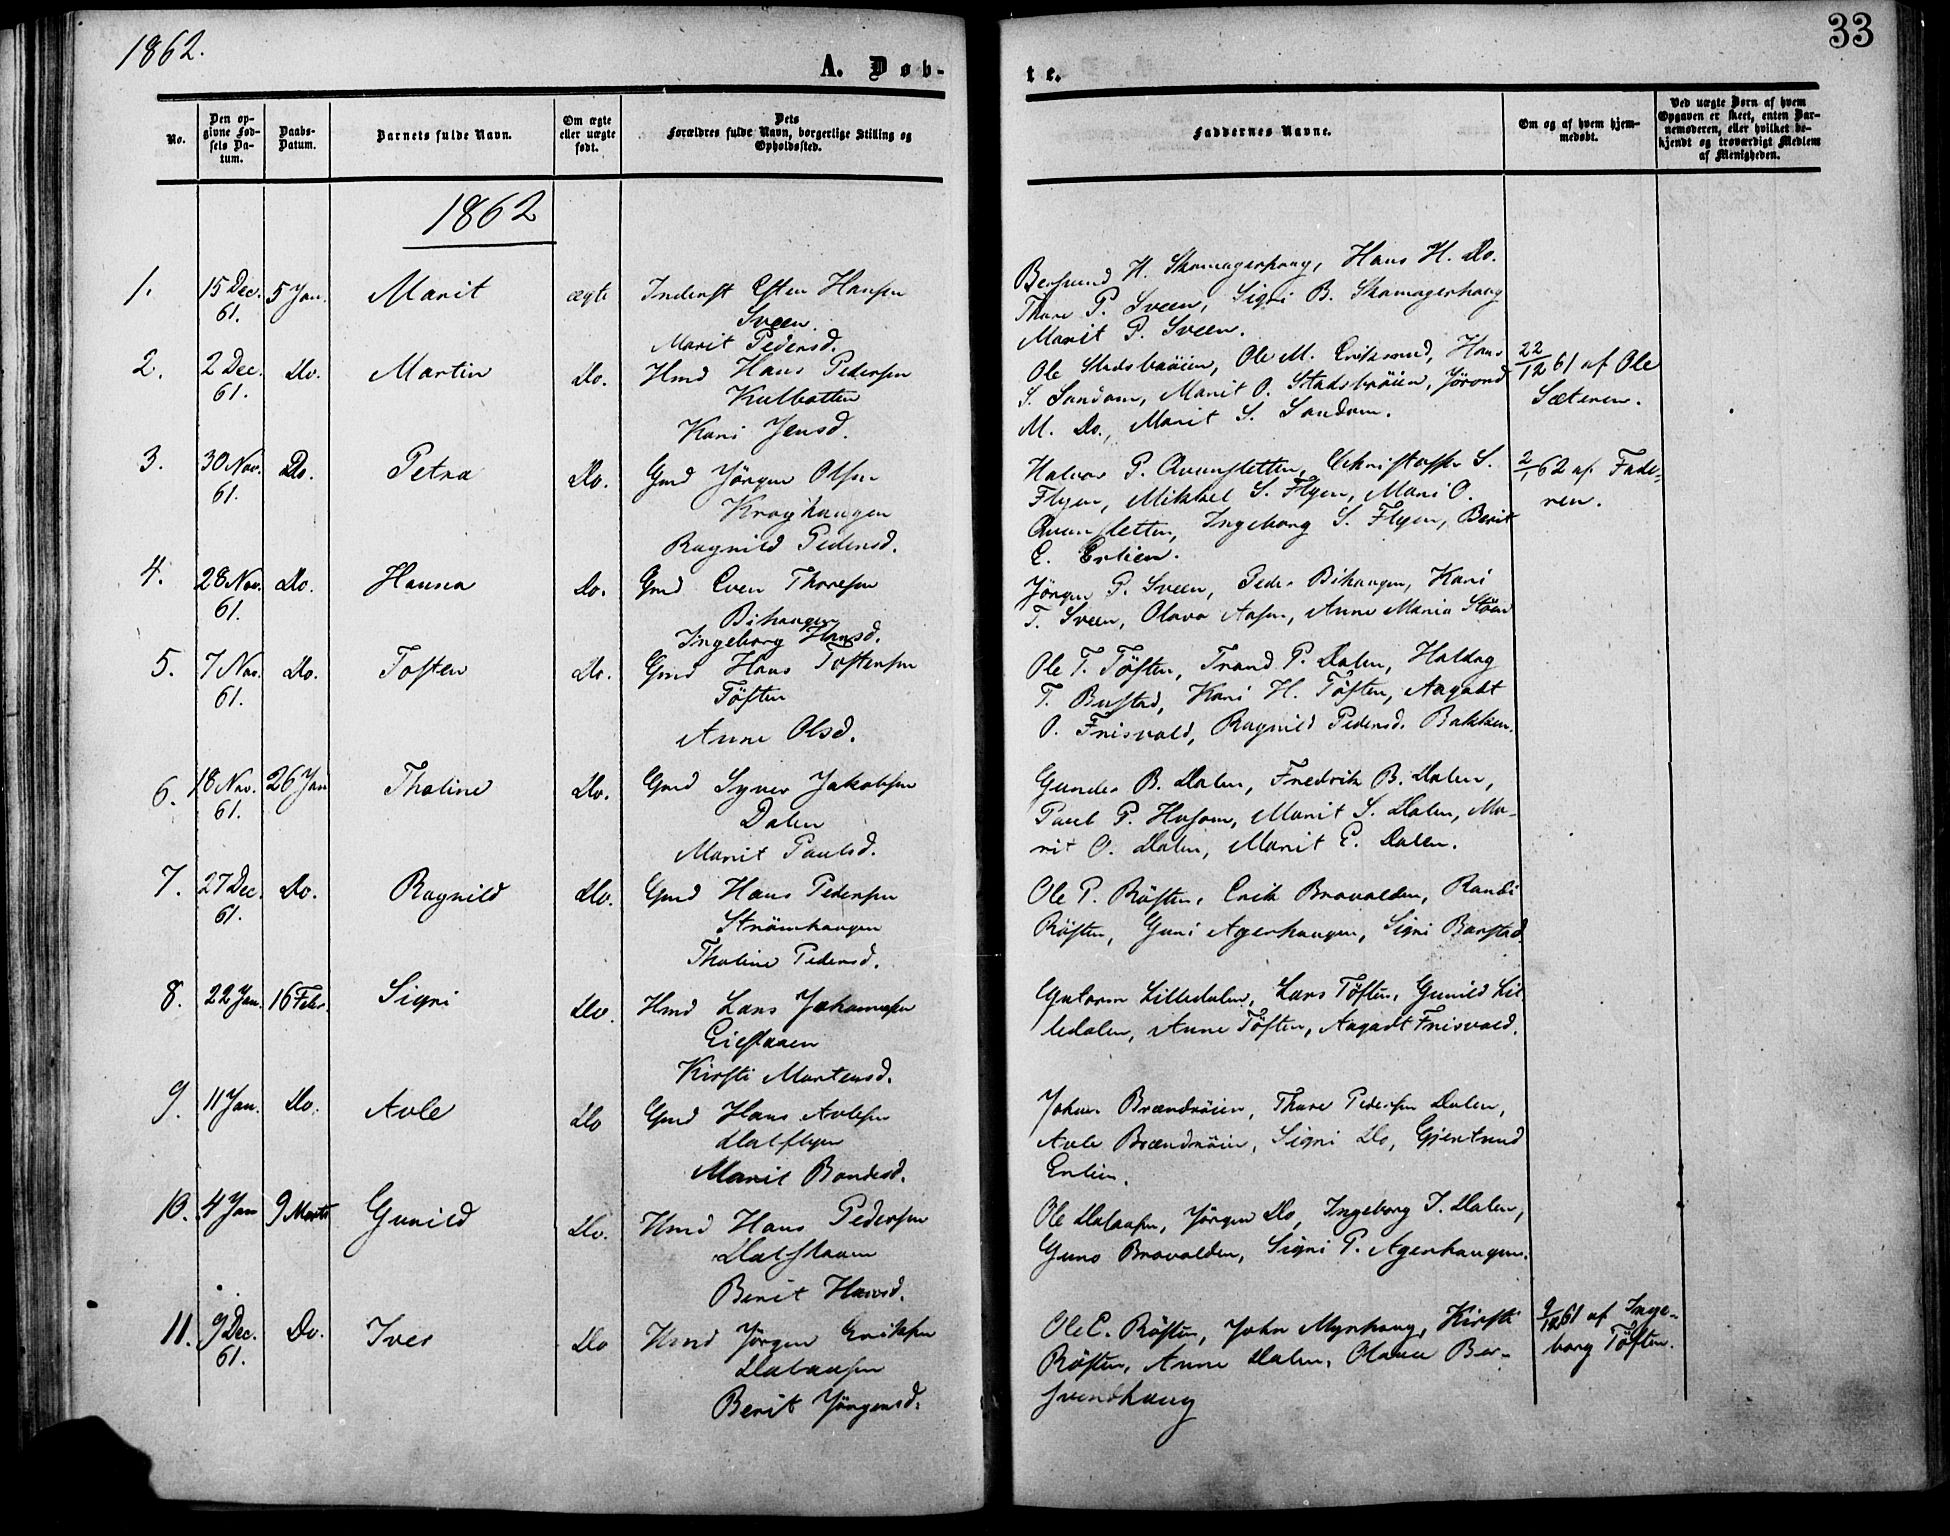 SAH, Lesja prestekontor, Ministerialbok nr. 7, 1854-1862, s. 33